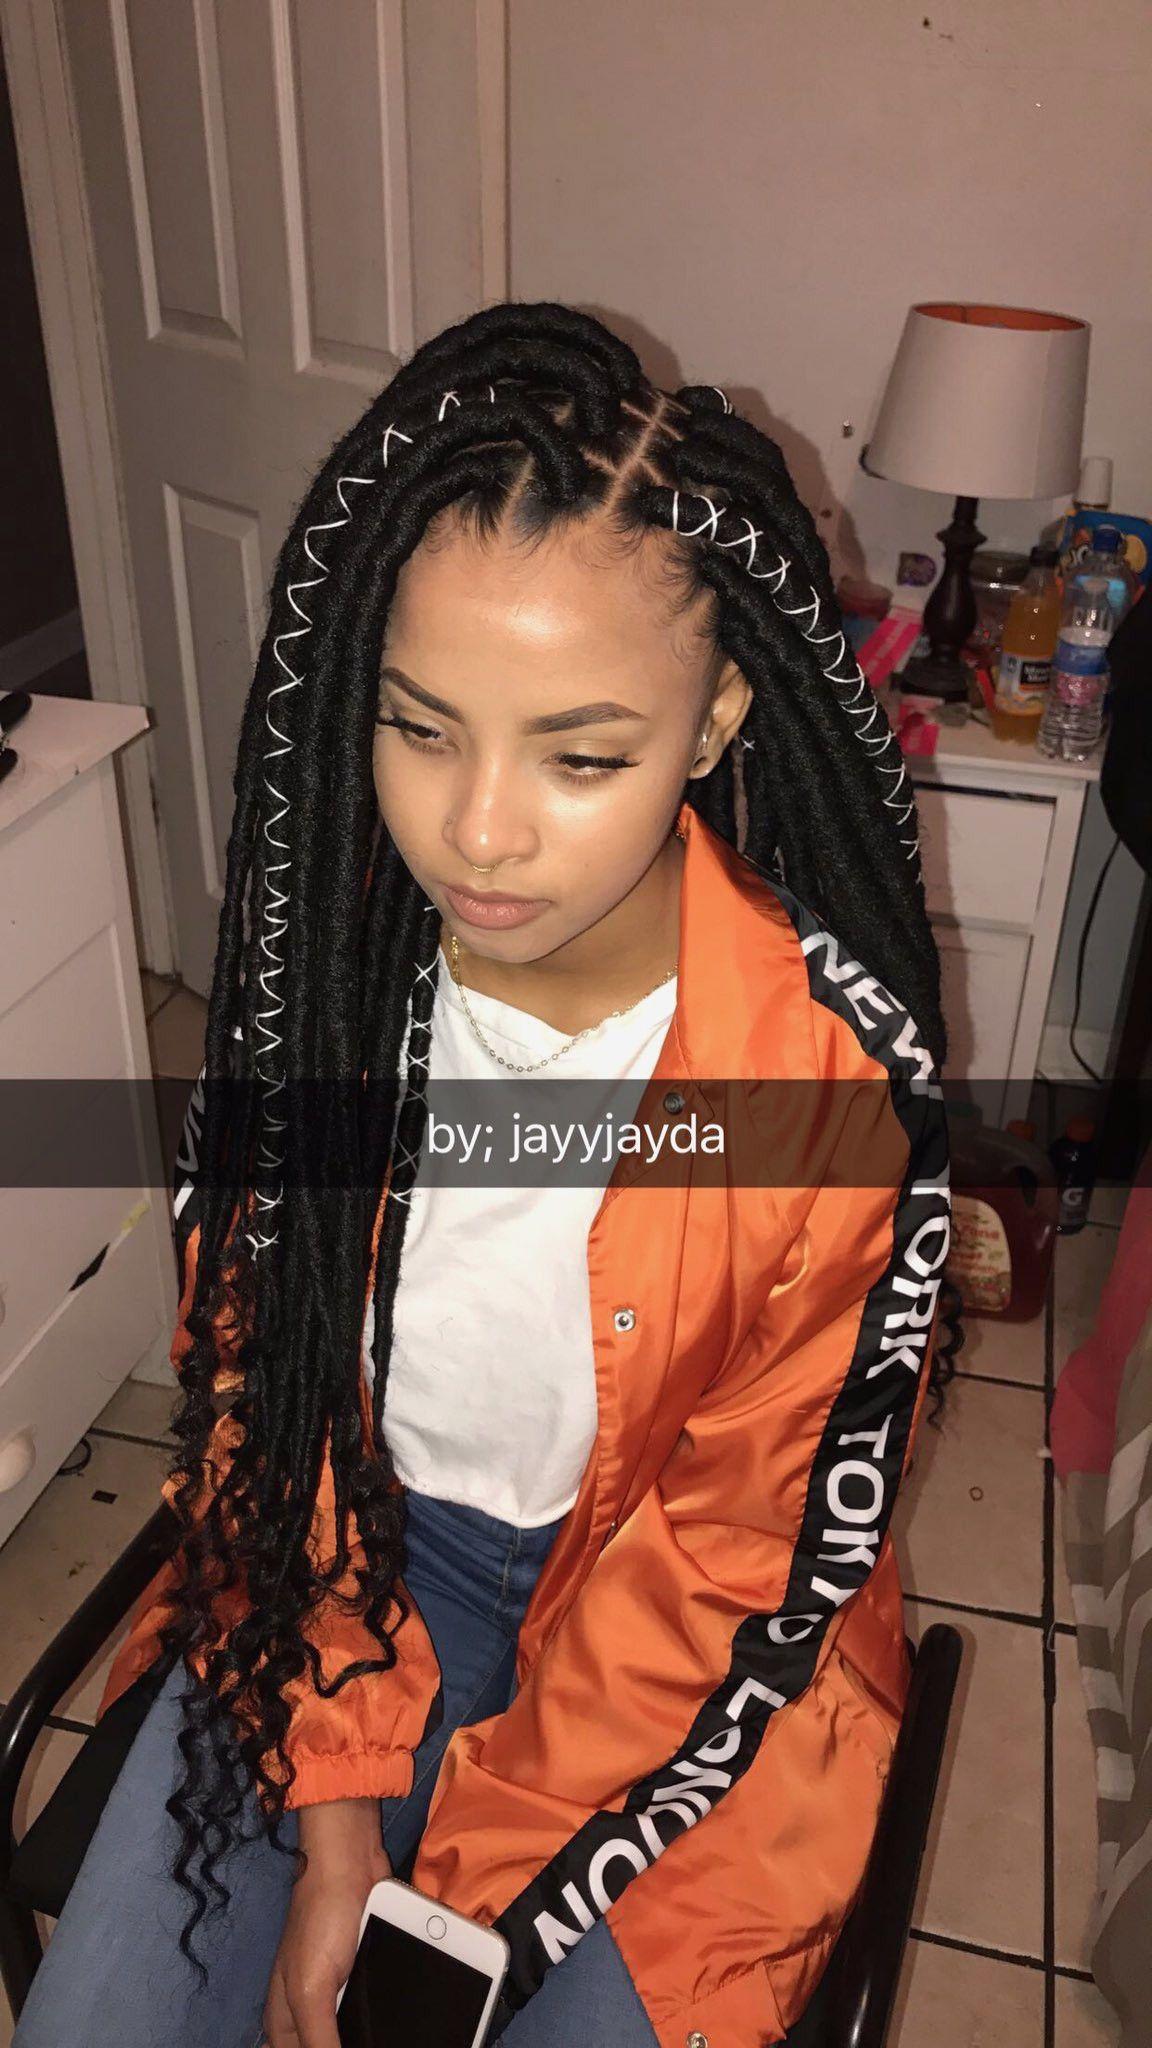 Pin By Jordyncrimiel On Hairr Nails Makeup Cool Braid Hairstyles Hair Styles Beautiful Hair